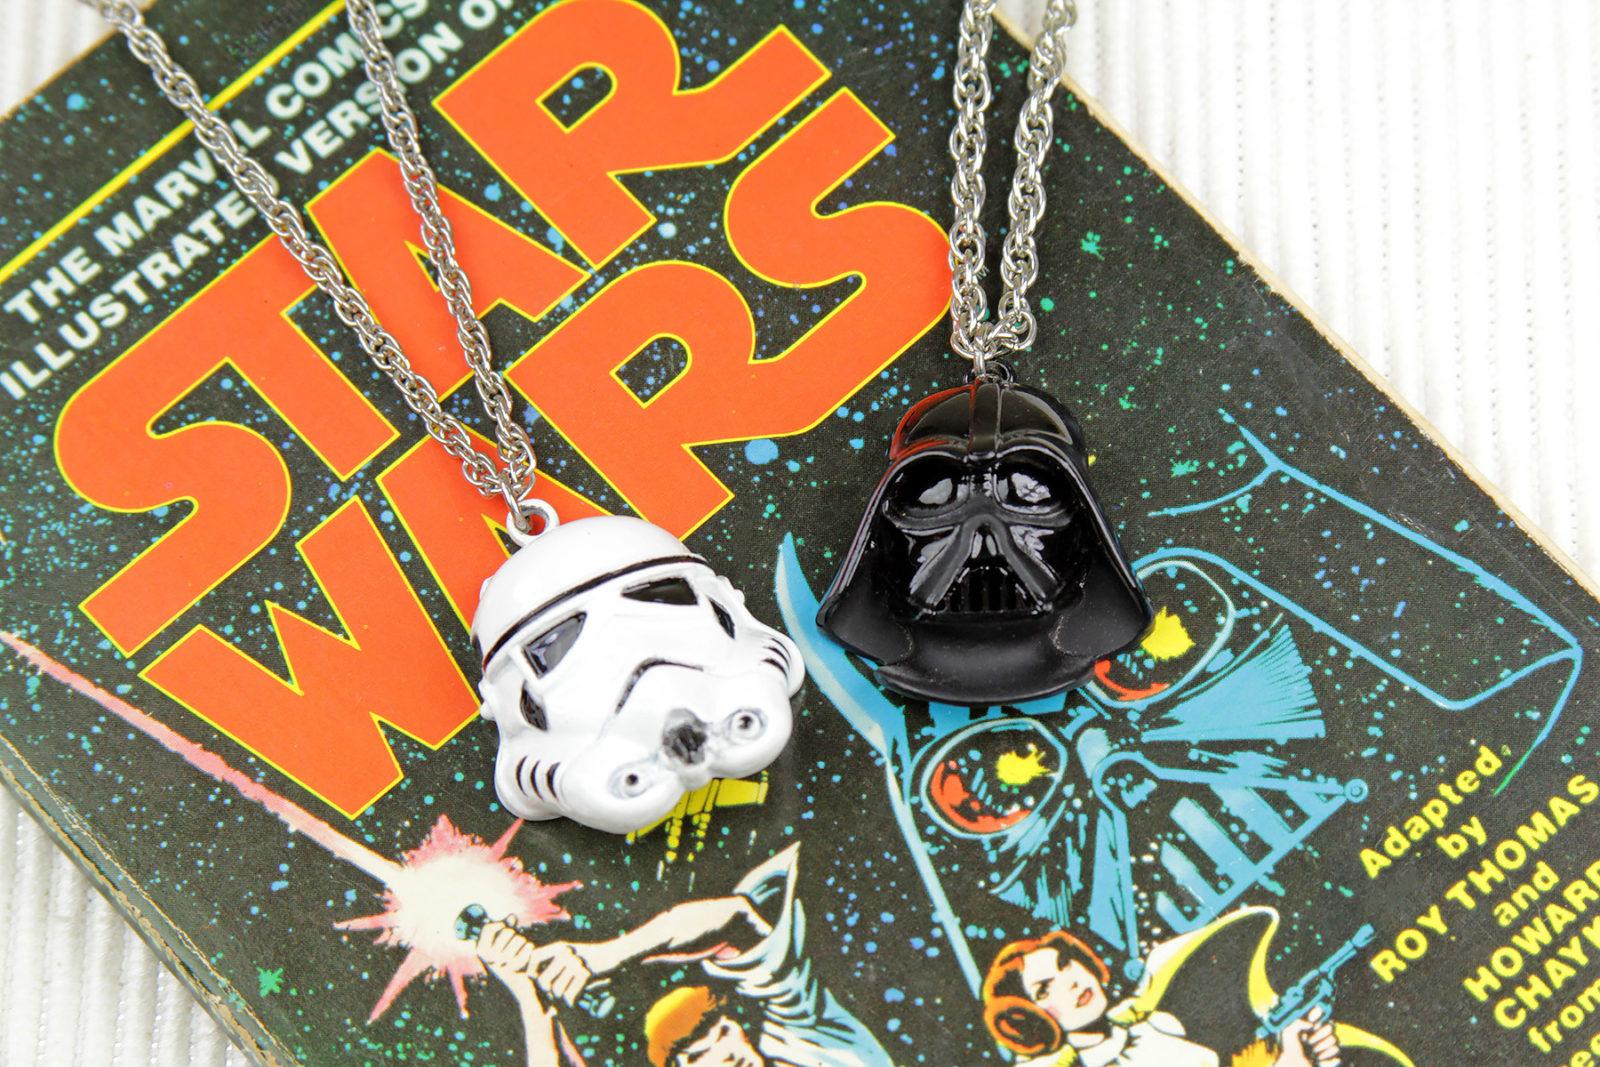 Happy 40th Anniversary Star Wars!